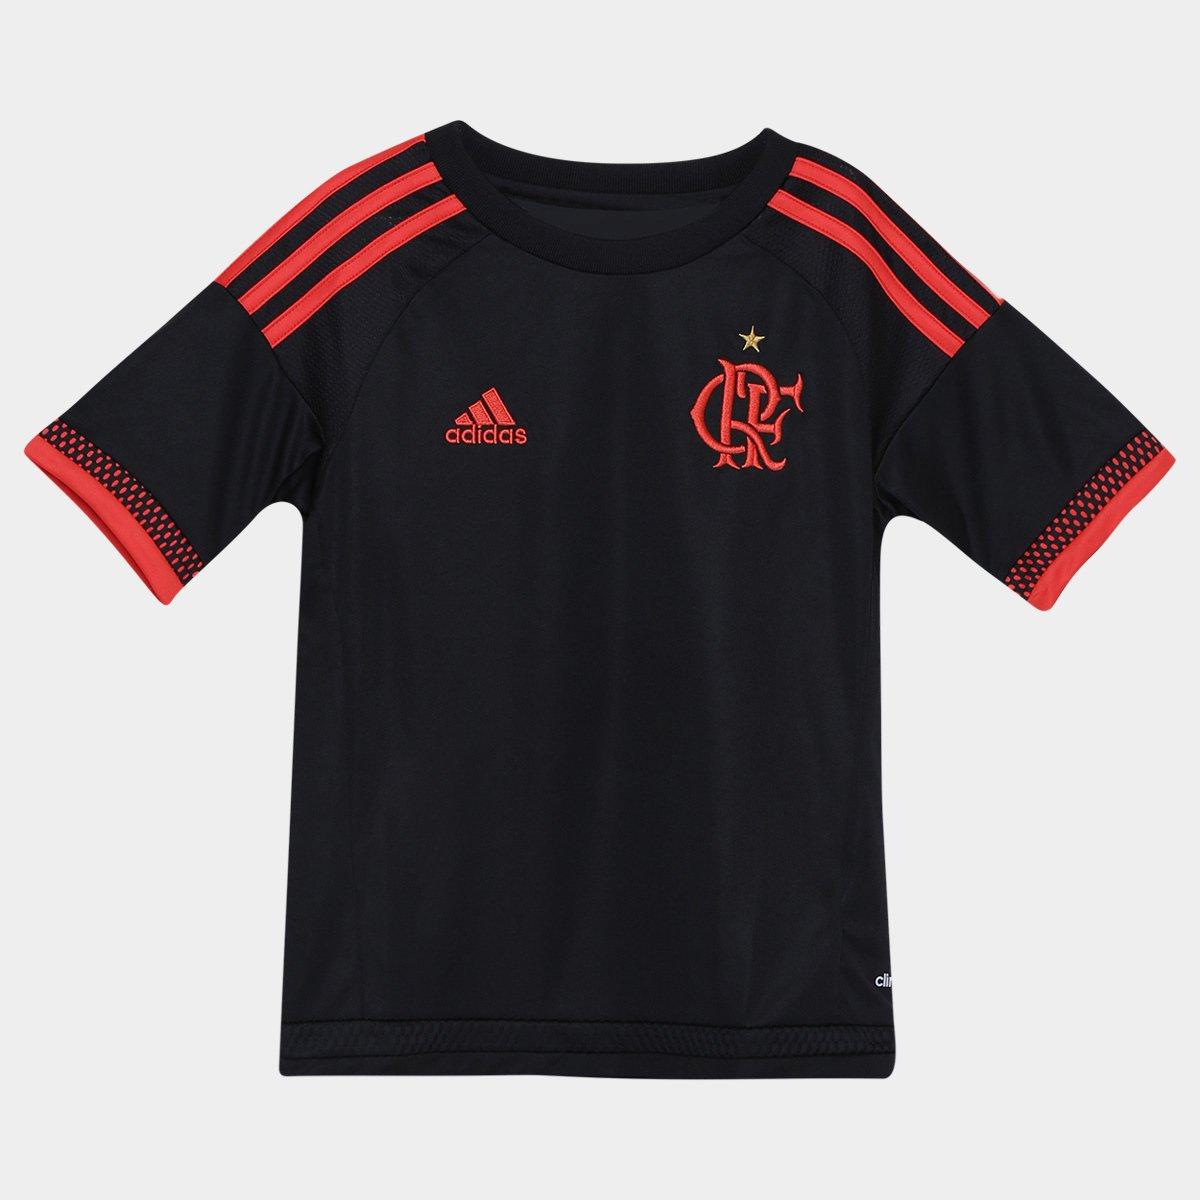 Camisa Flamengo Infantil III 2016 s nº Adidas - Compre Agora  c202ad051ac